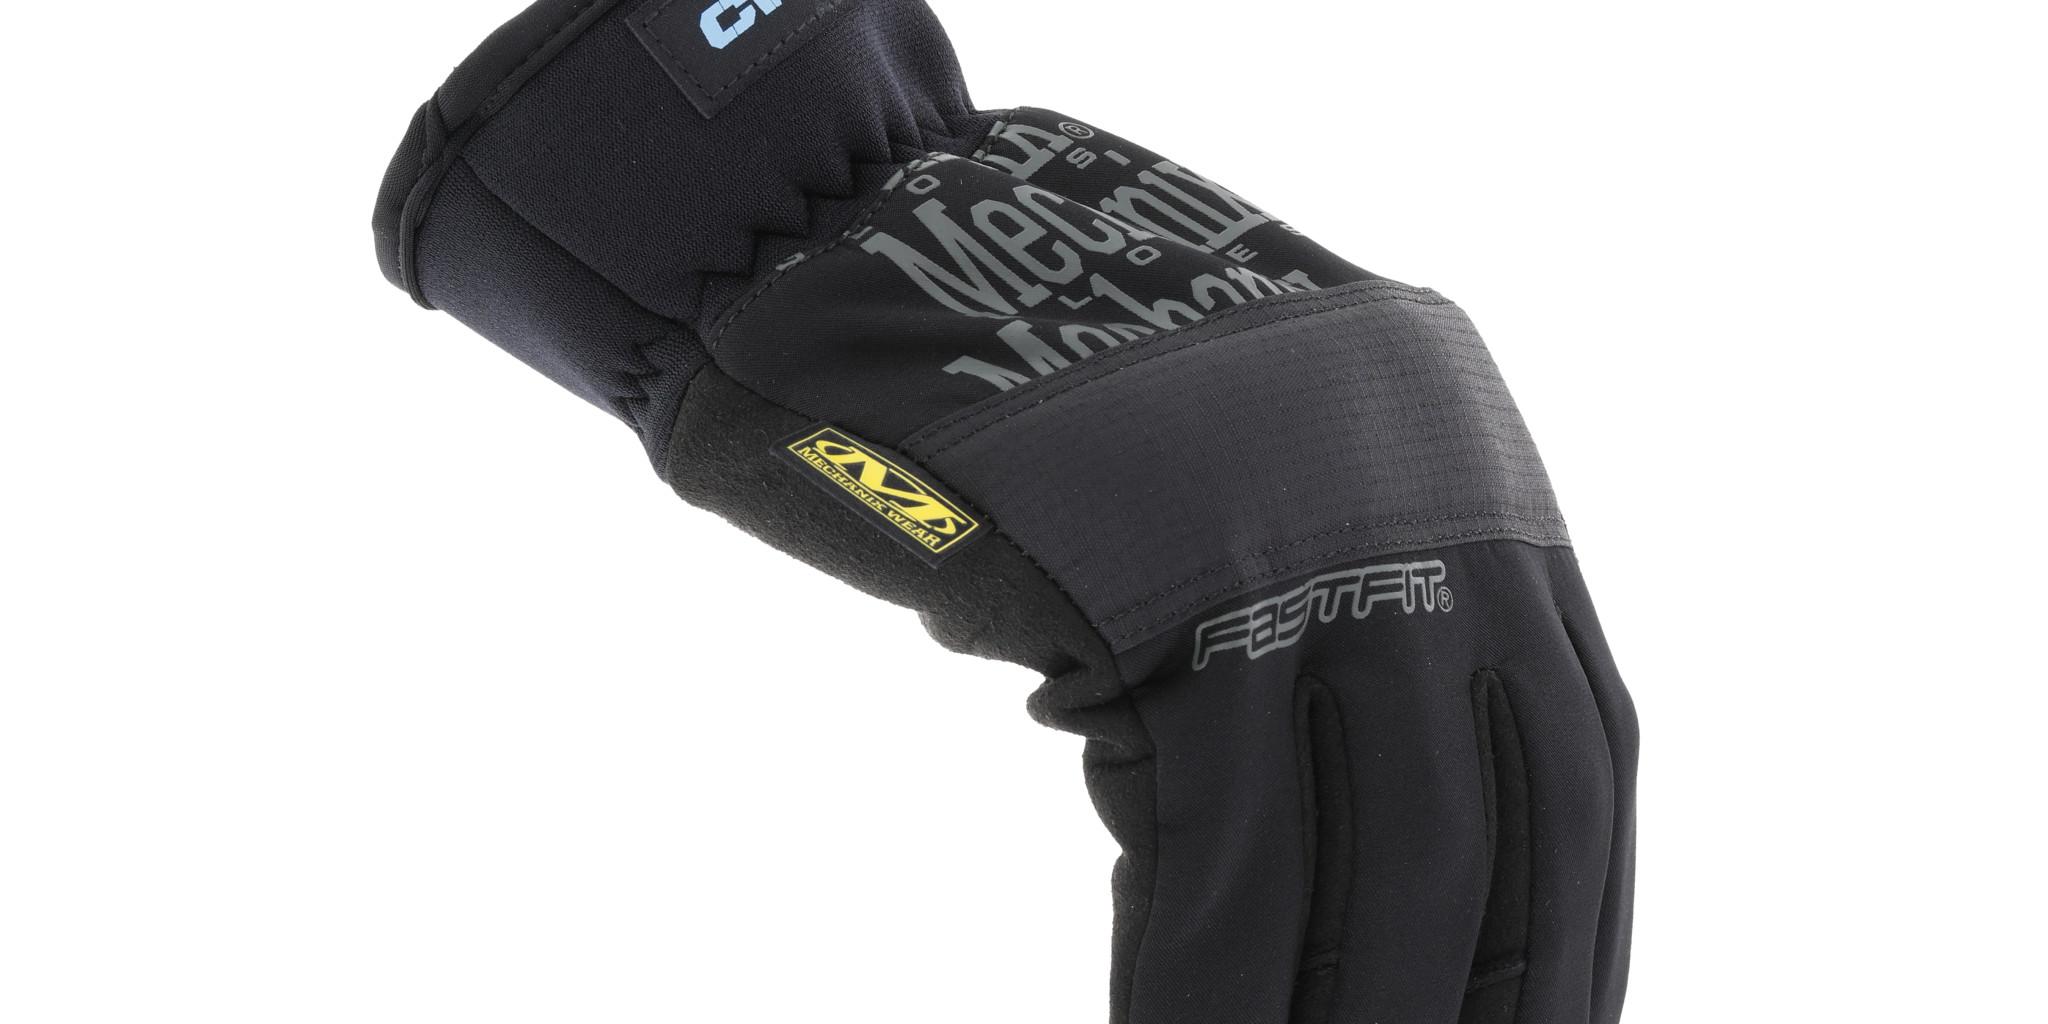 Fastfit 174 Insulated Insulated Work Gloves Mechanix Wear